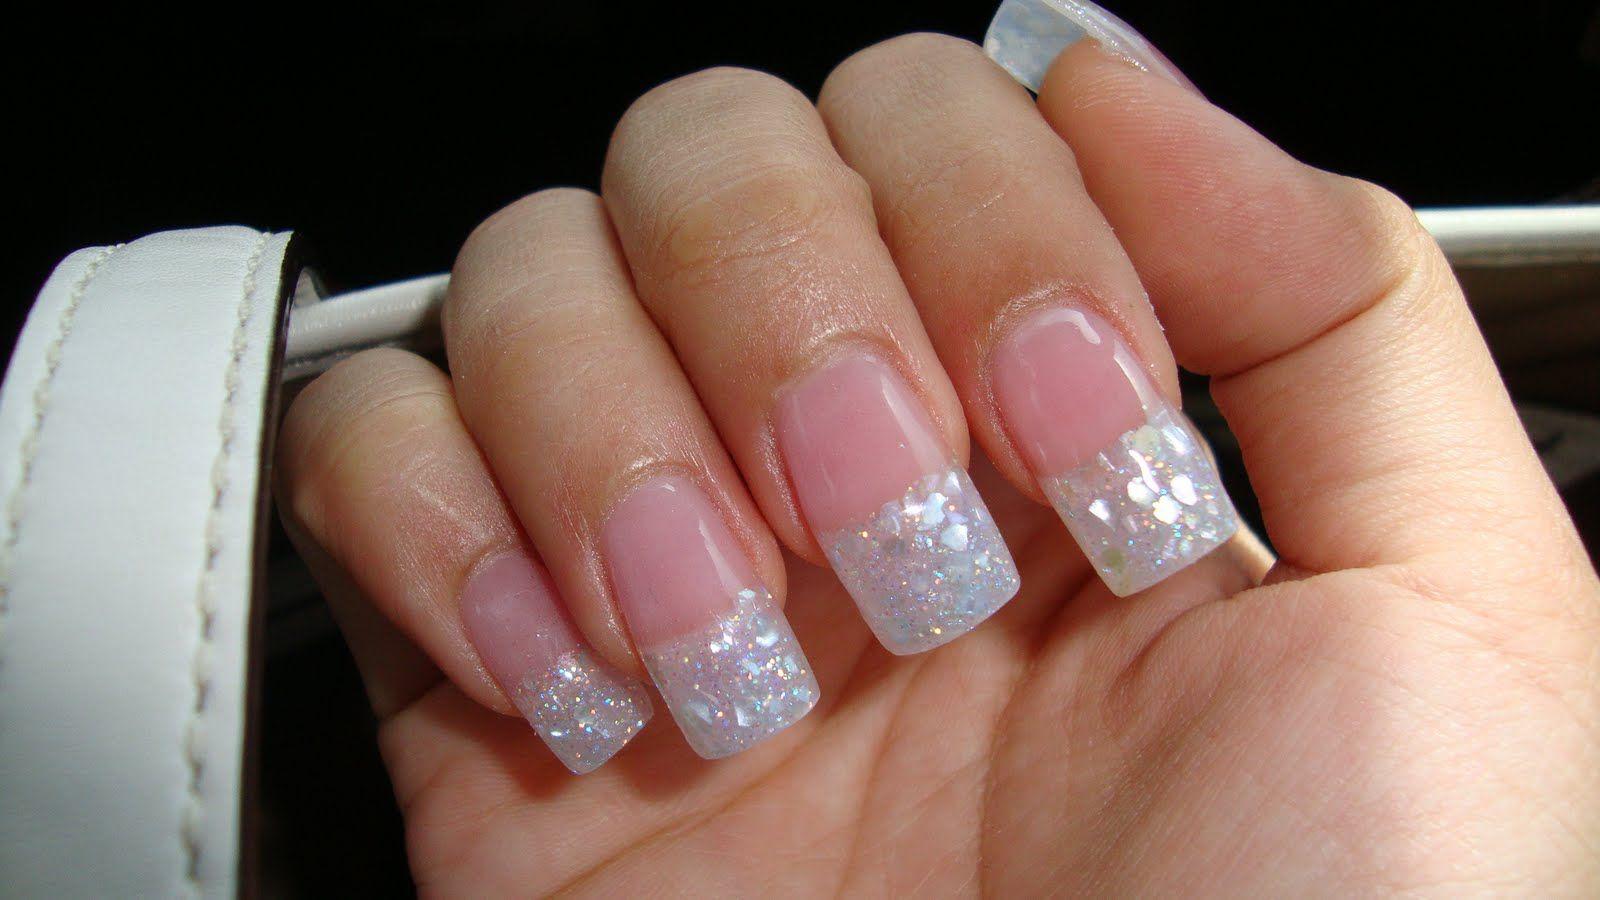 Outstanding Tip Gel Nails Pattern - Nail Art Ideas - morihati.com